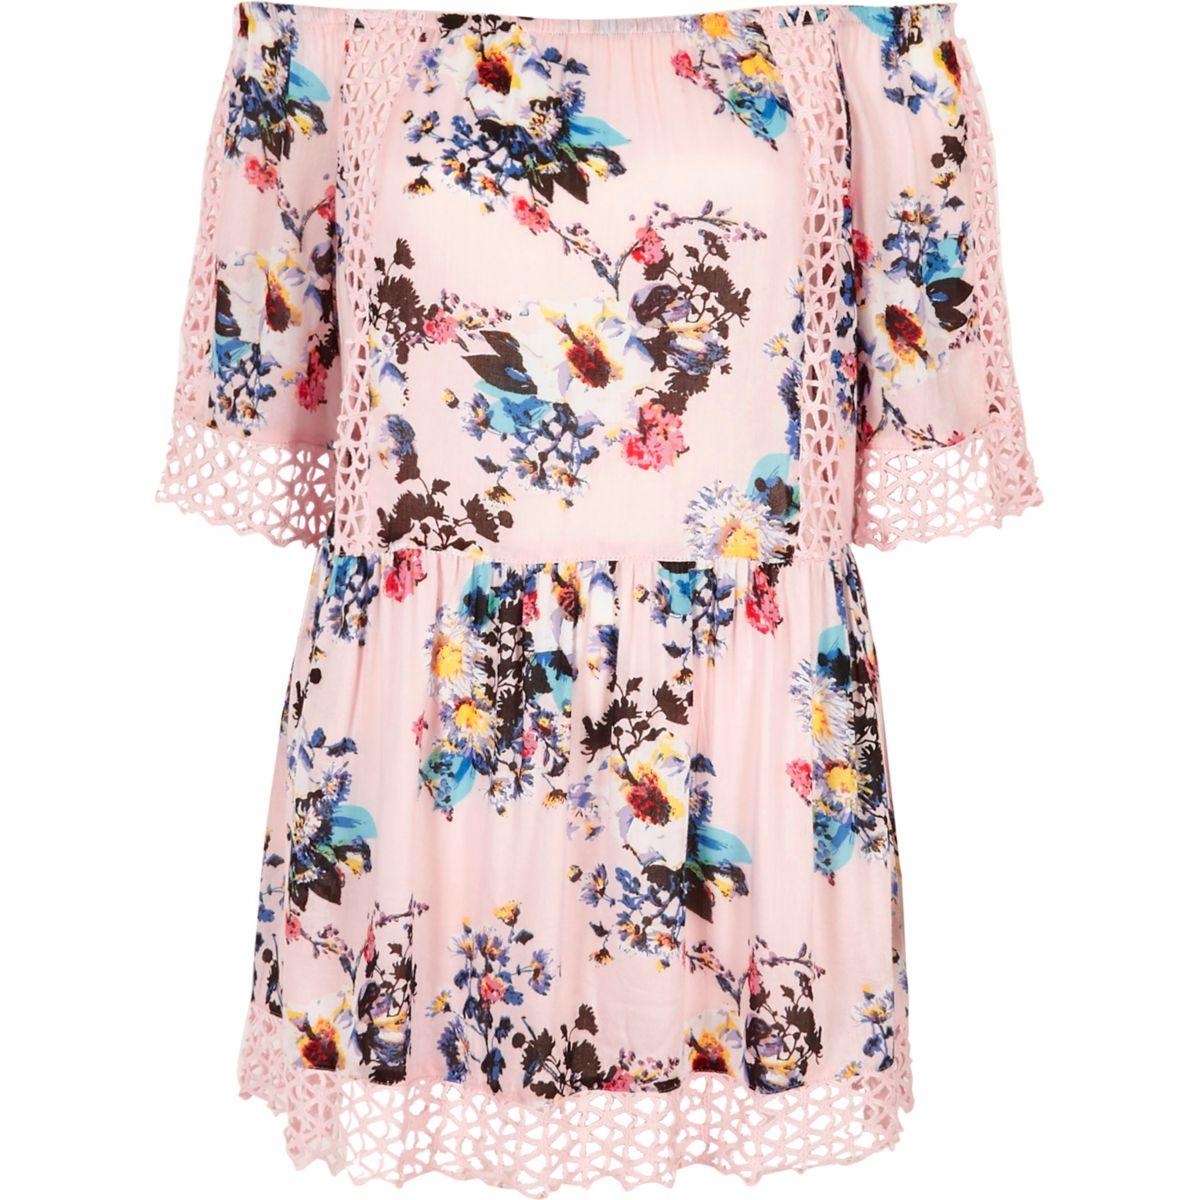 Pink floral bardot cutwork lace beach dress